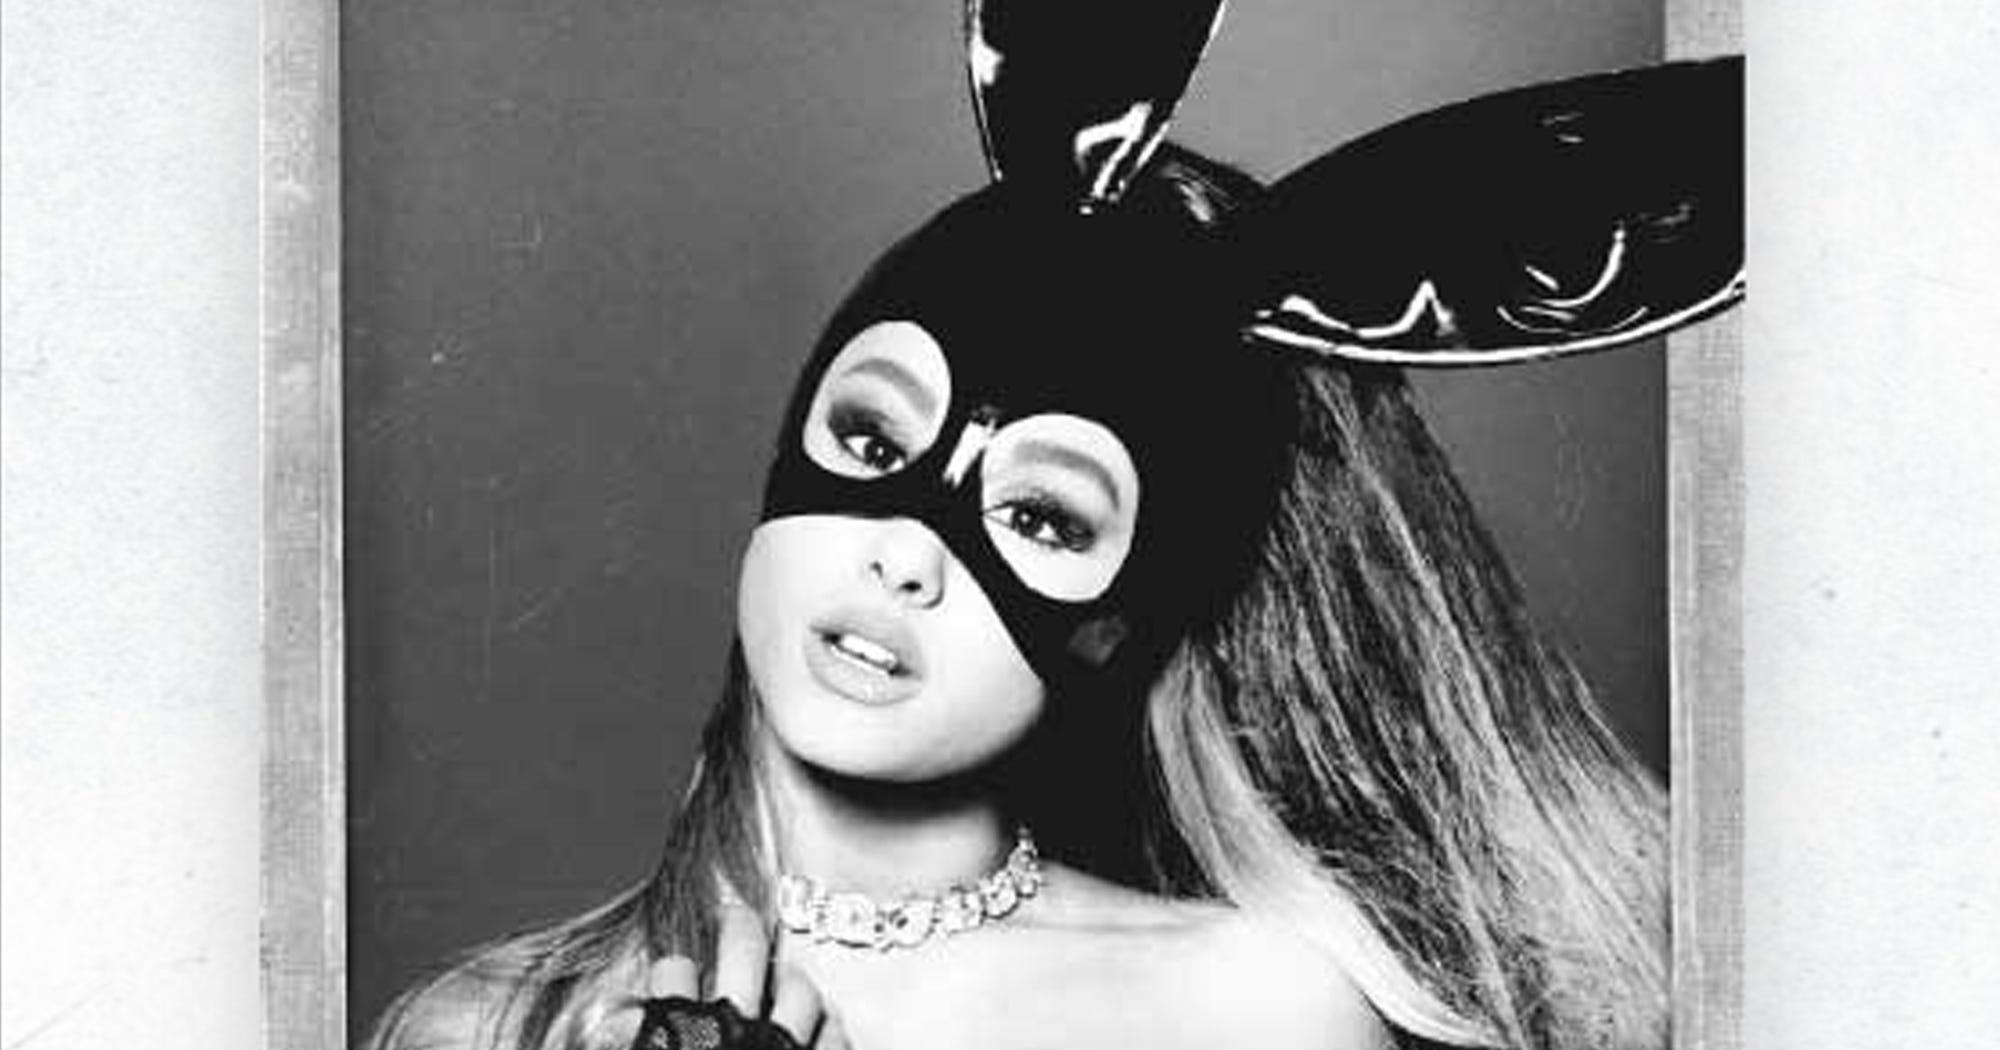 Ariana Grande: Dangerous Woman   Album Review   Slant Magazine  Dangerous Woman